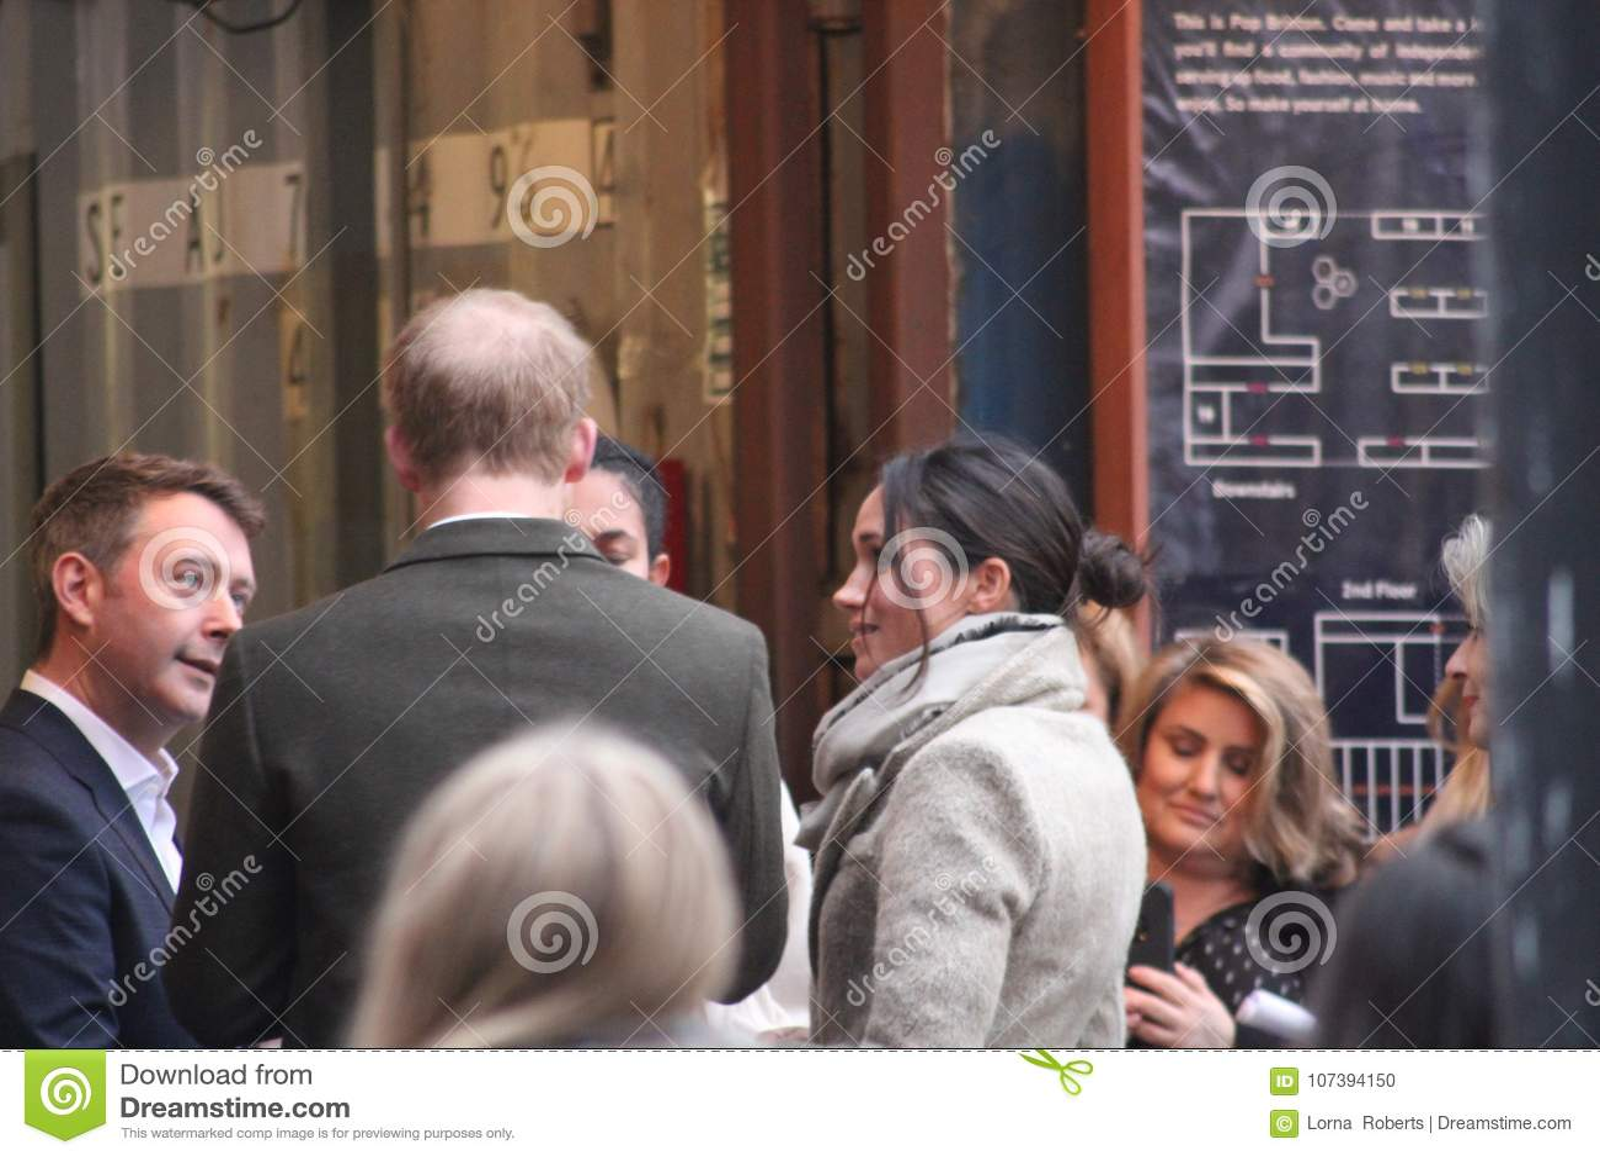 Prince Harry And Meghan Markle Visit Reprezent Radio At POP Brixton